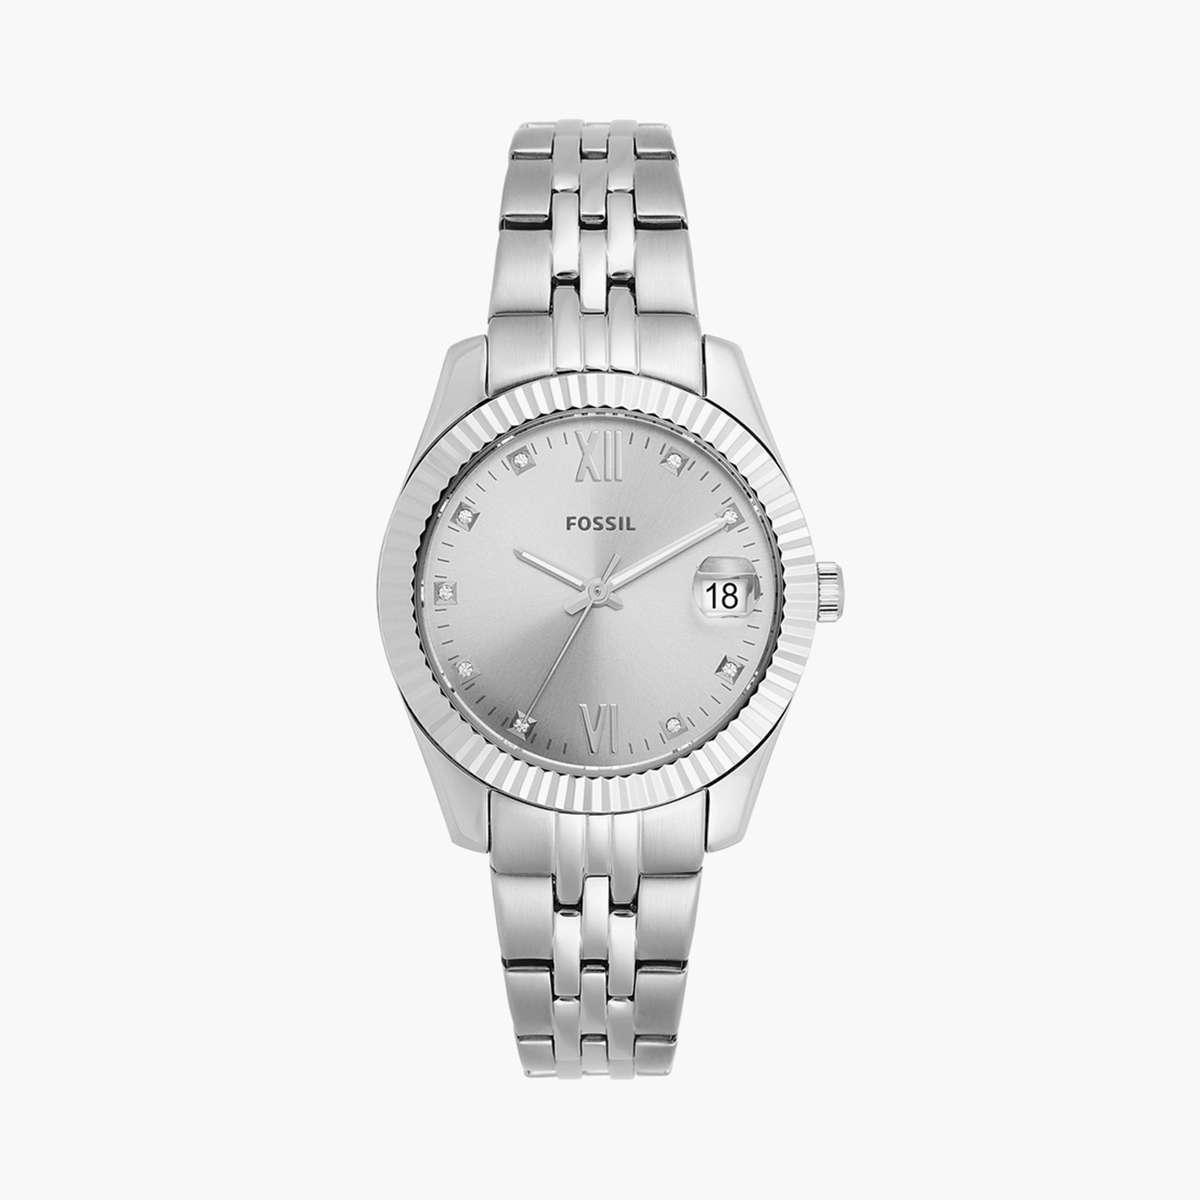 4.FOSSIL Scarlette Mini Women Analog Watch- ES4897